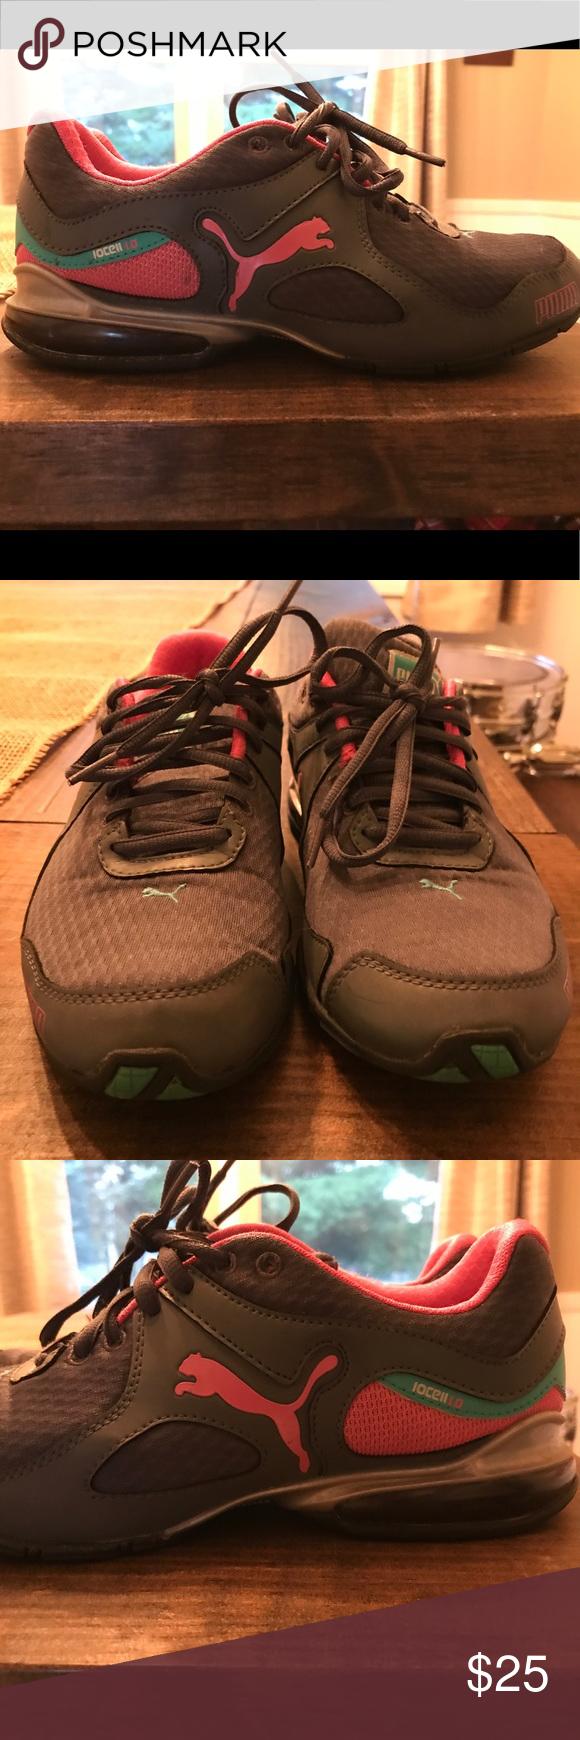 Puma 10cell 1.0 Running Shoes   Dress